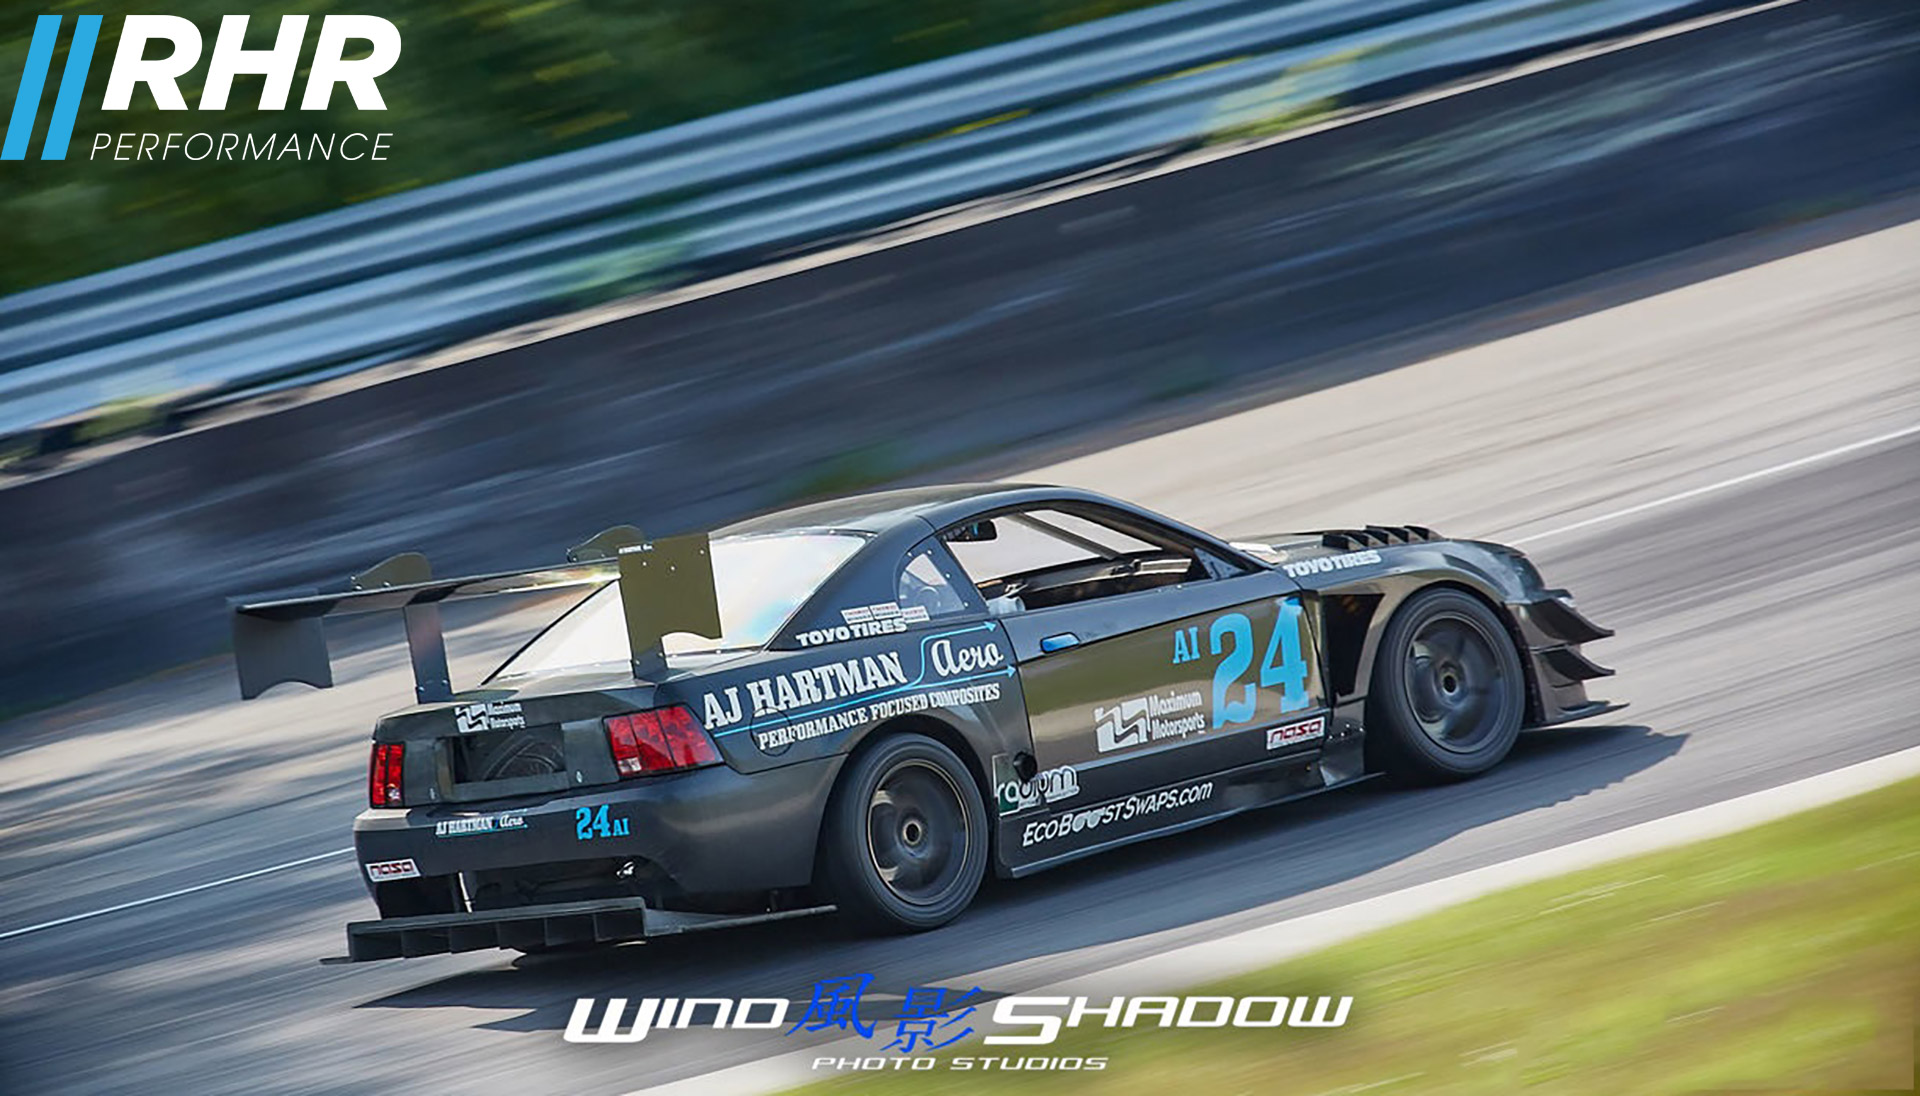 Aerodynamic Trailblazers: How RHR Performance Wings It   Articles